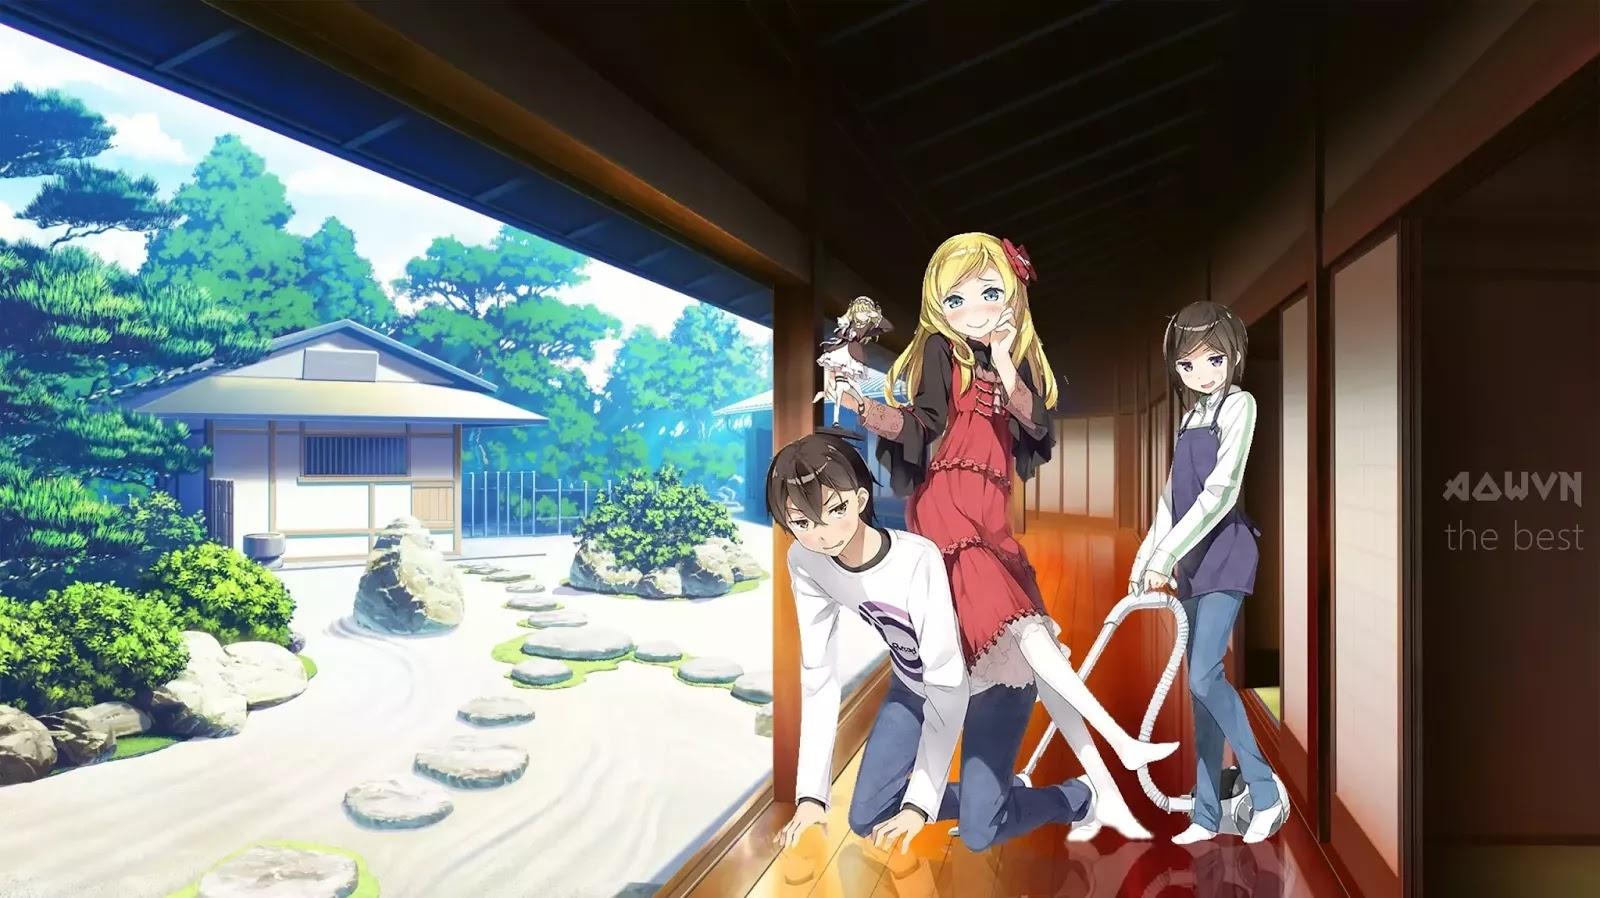 AowVN m%2B%25283%2529 - [ Anime 3gp Mp4 ] Imouto sae Ireba Ii | Vietsub - Hài Hước